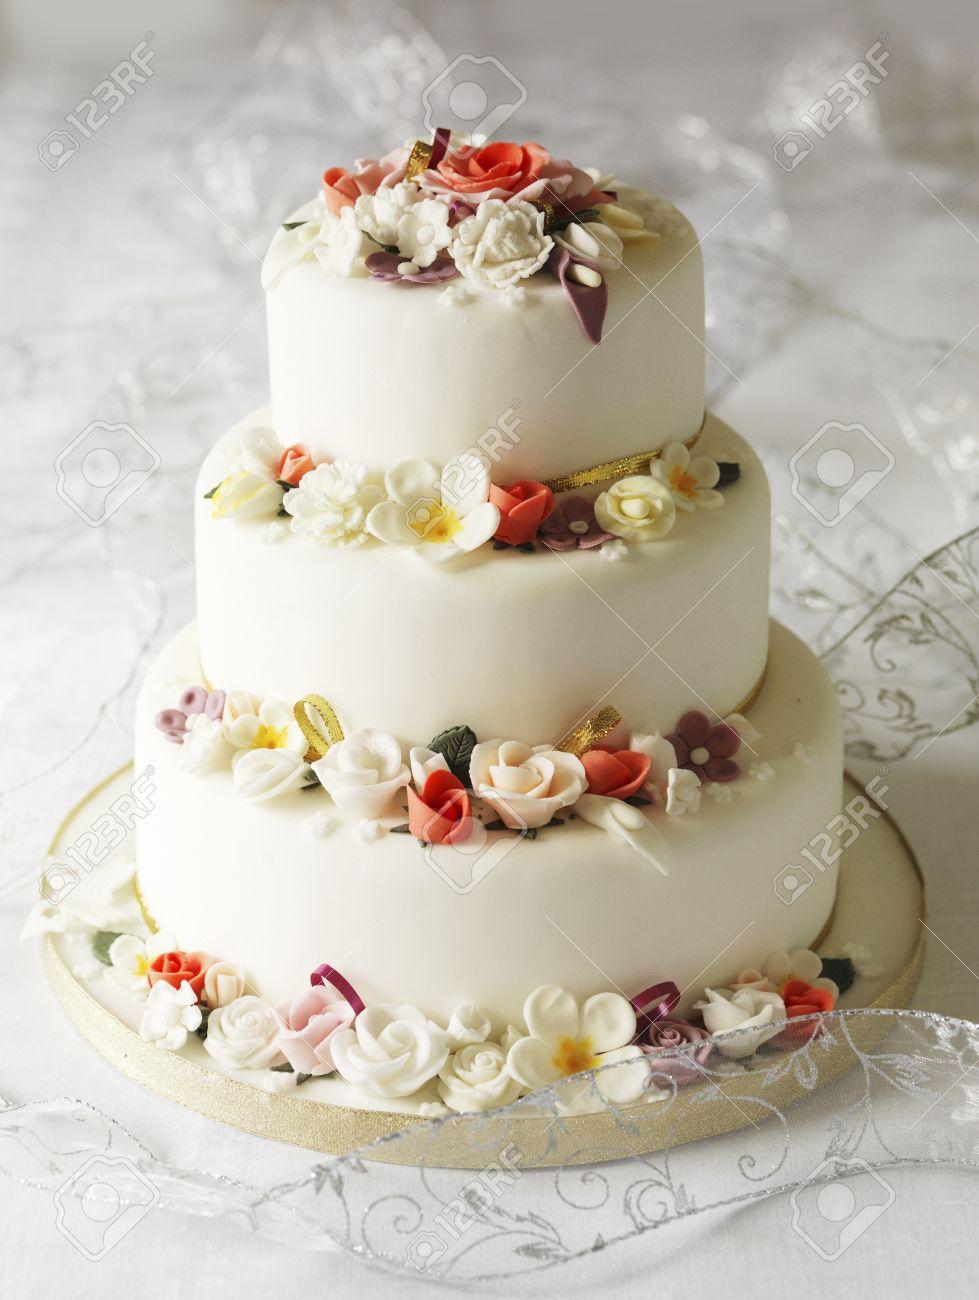 Three Tier Wedding Cake With Fondant Flowers Stock Photo